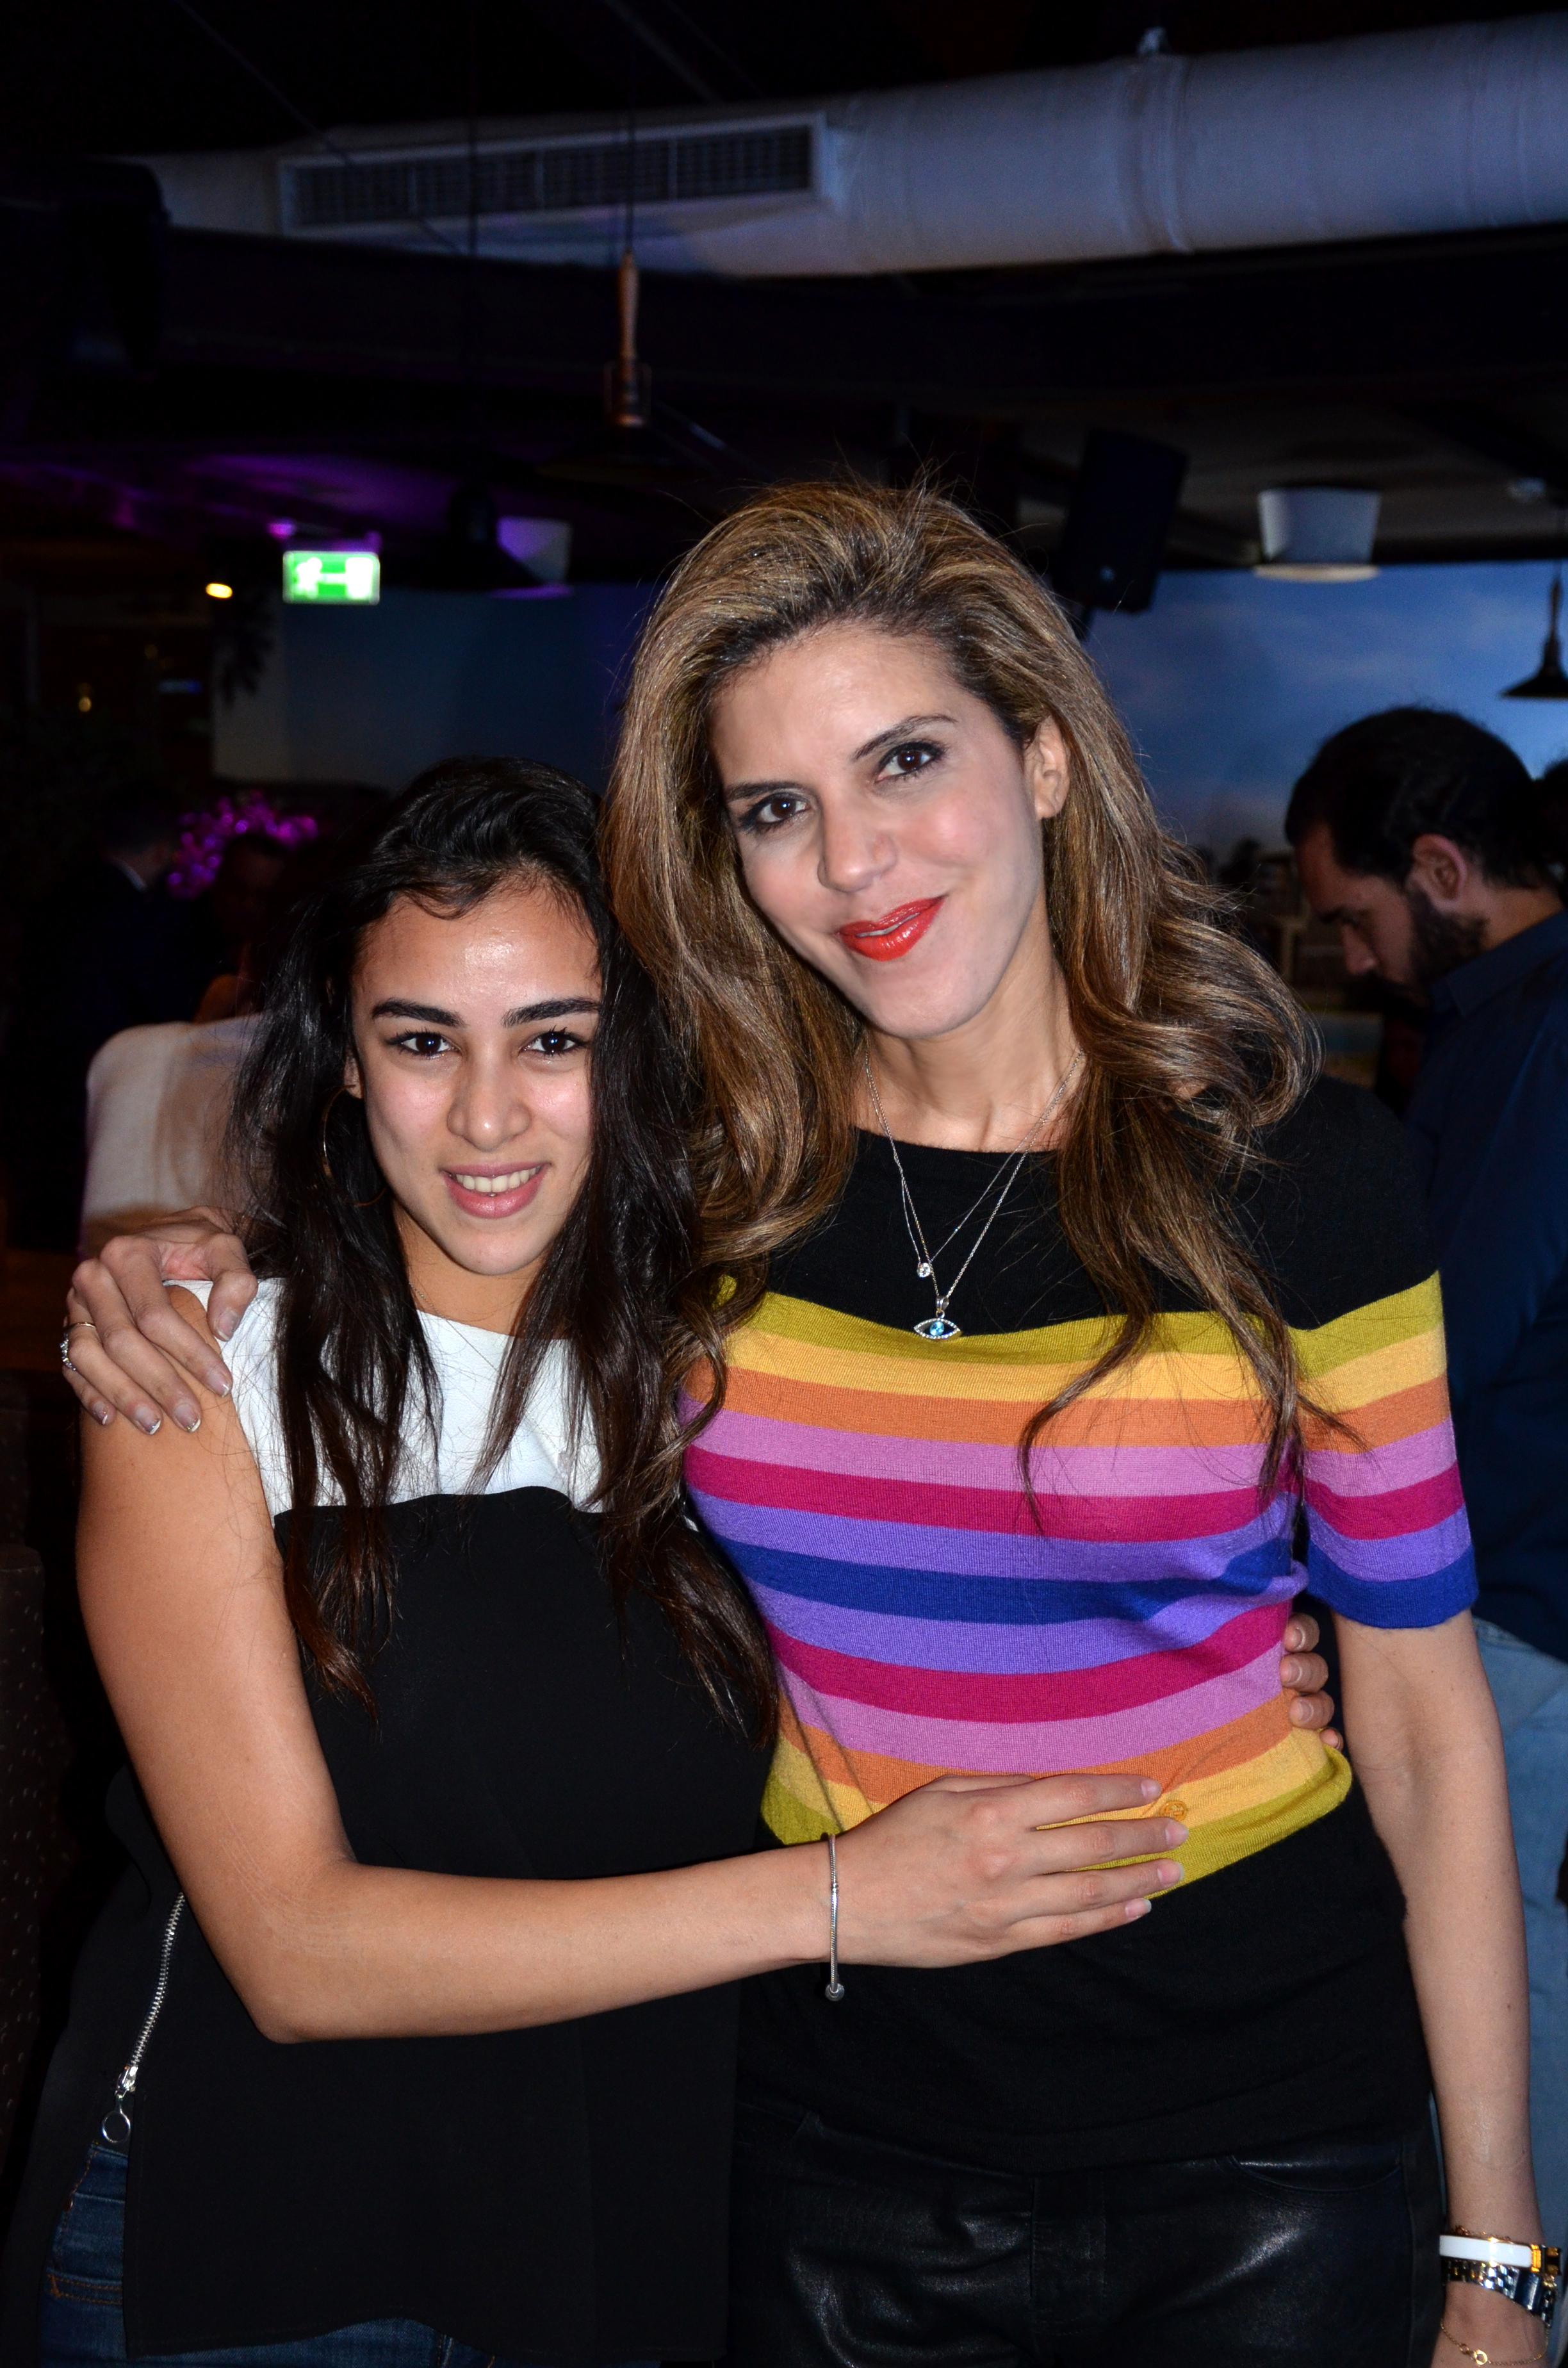 Ms. Mariam Armanious & Ms. Yasmine Shihata